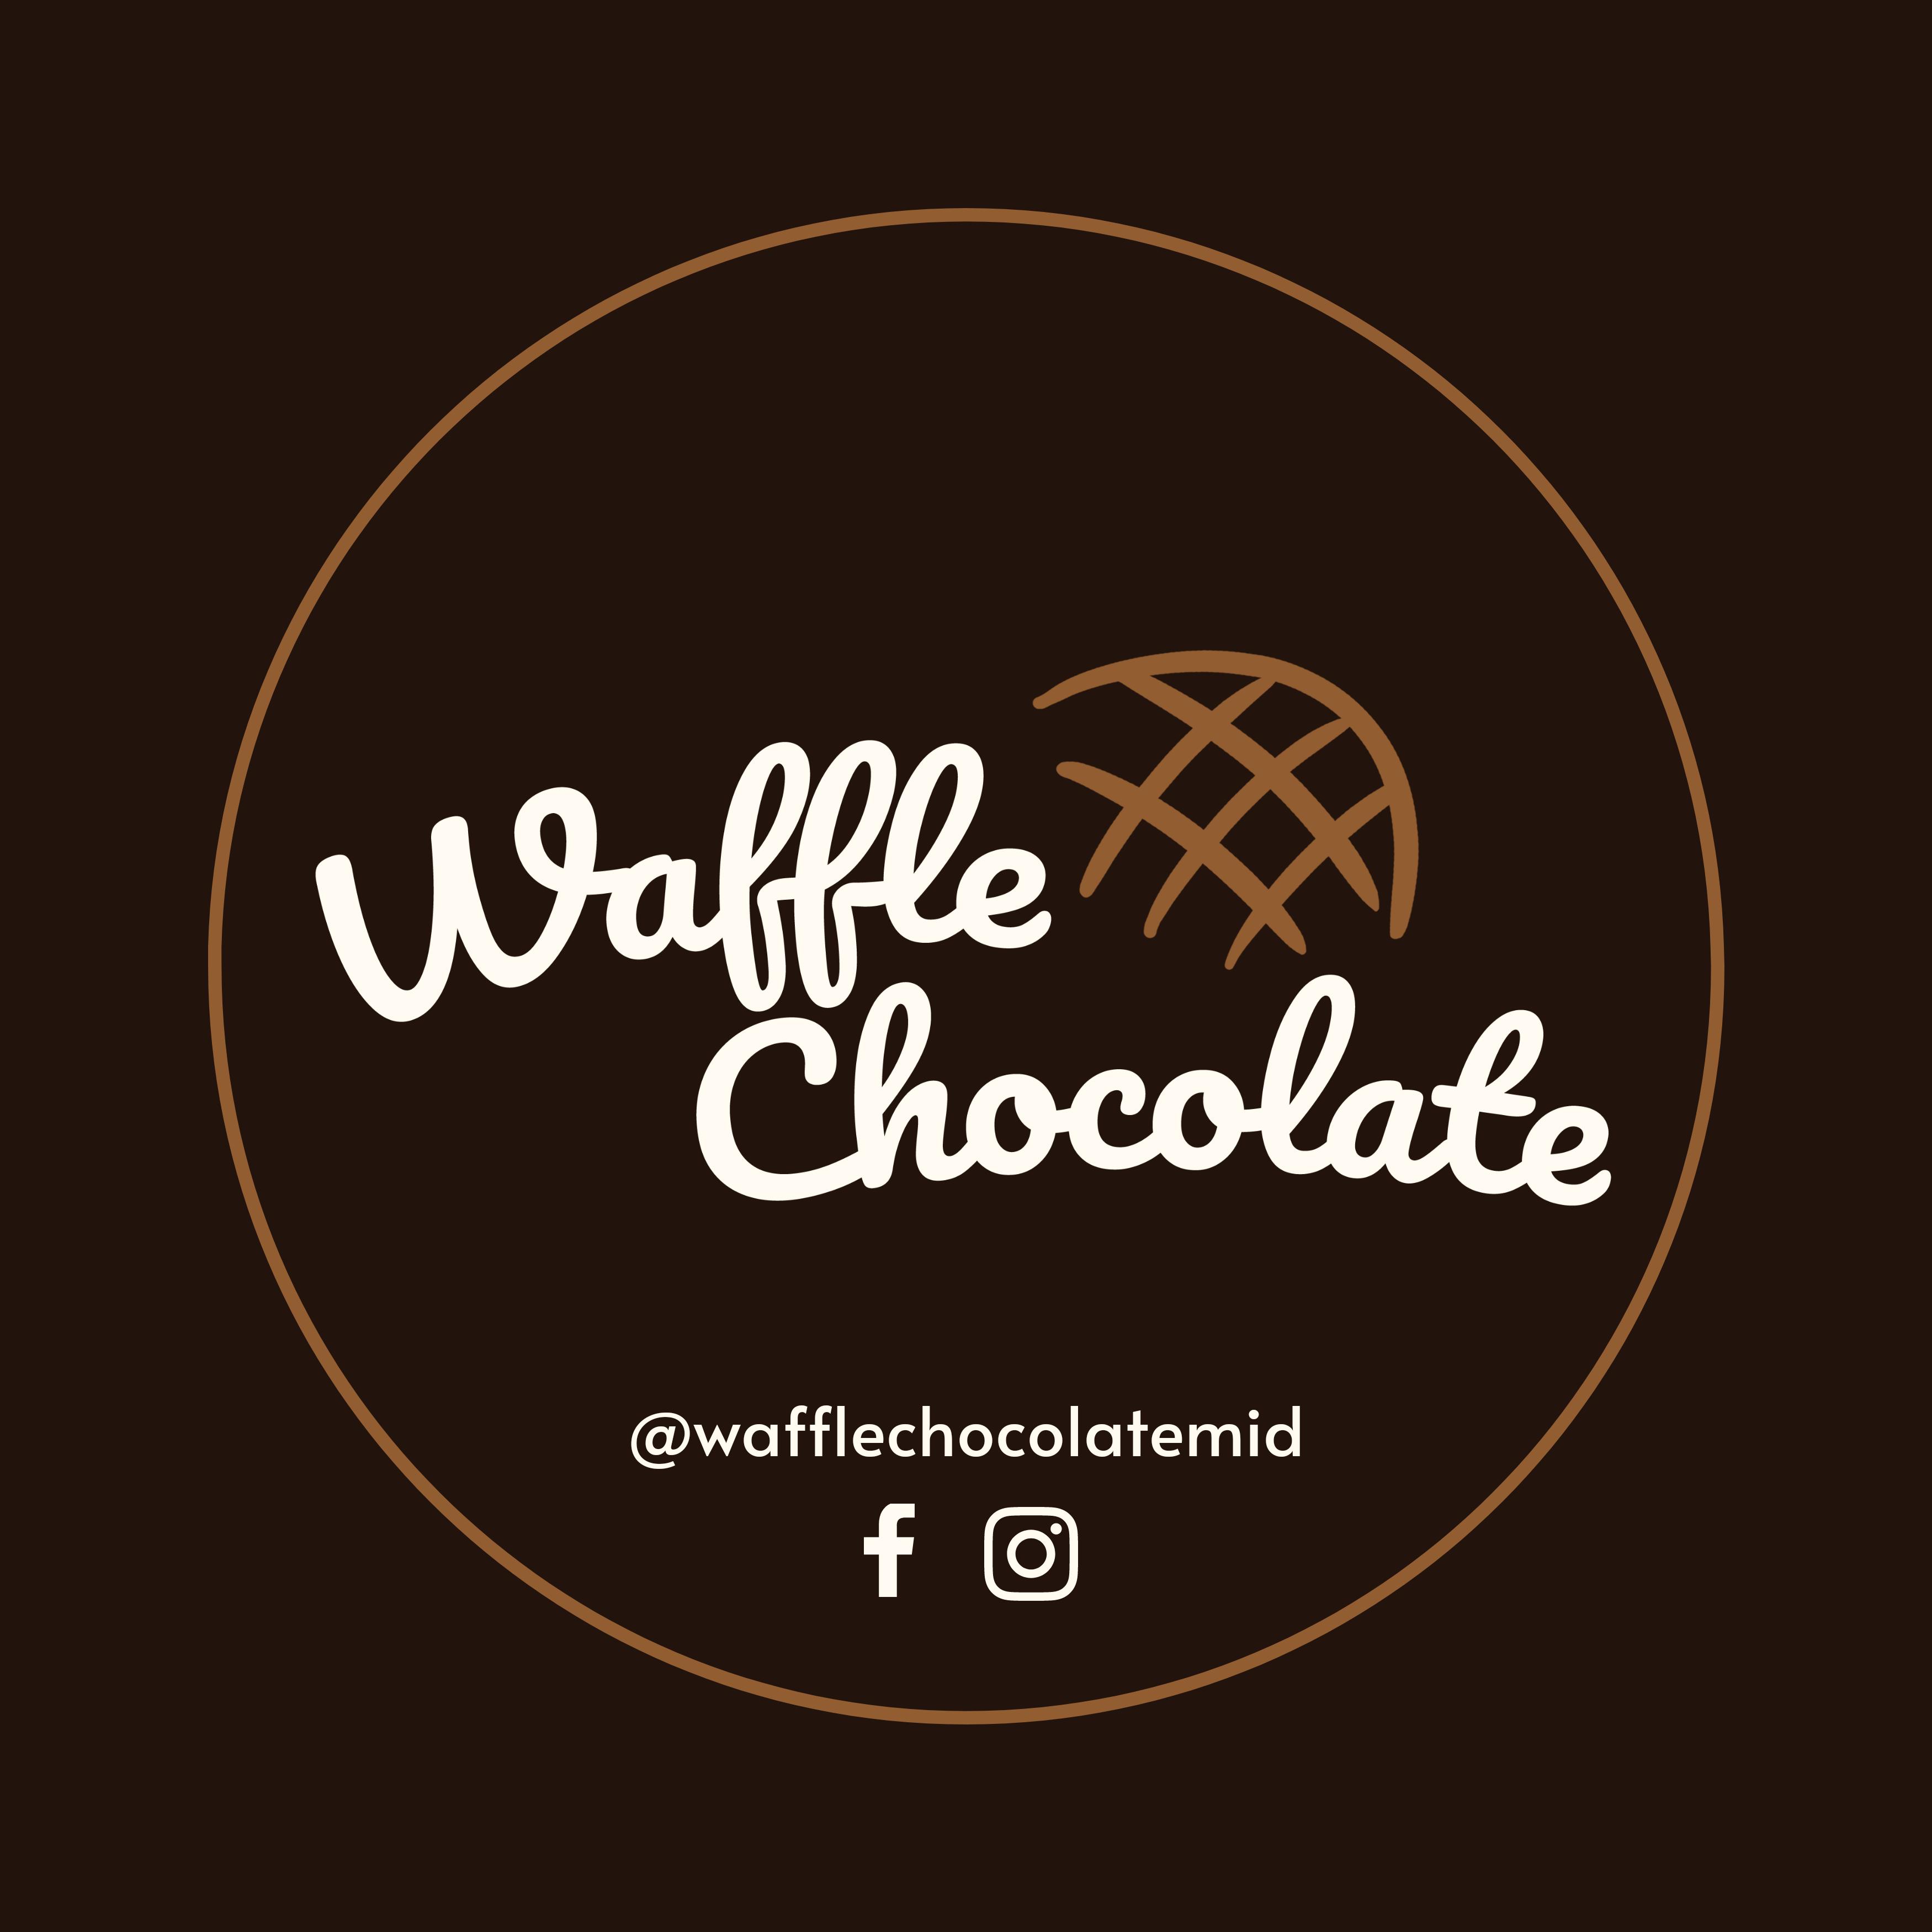 WAFFLE CHOCOLATE MID